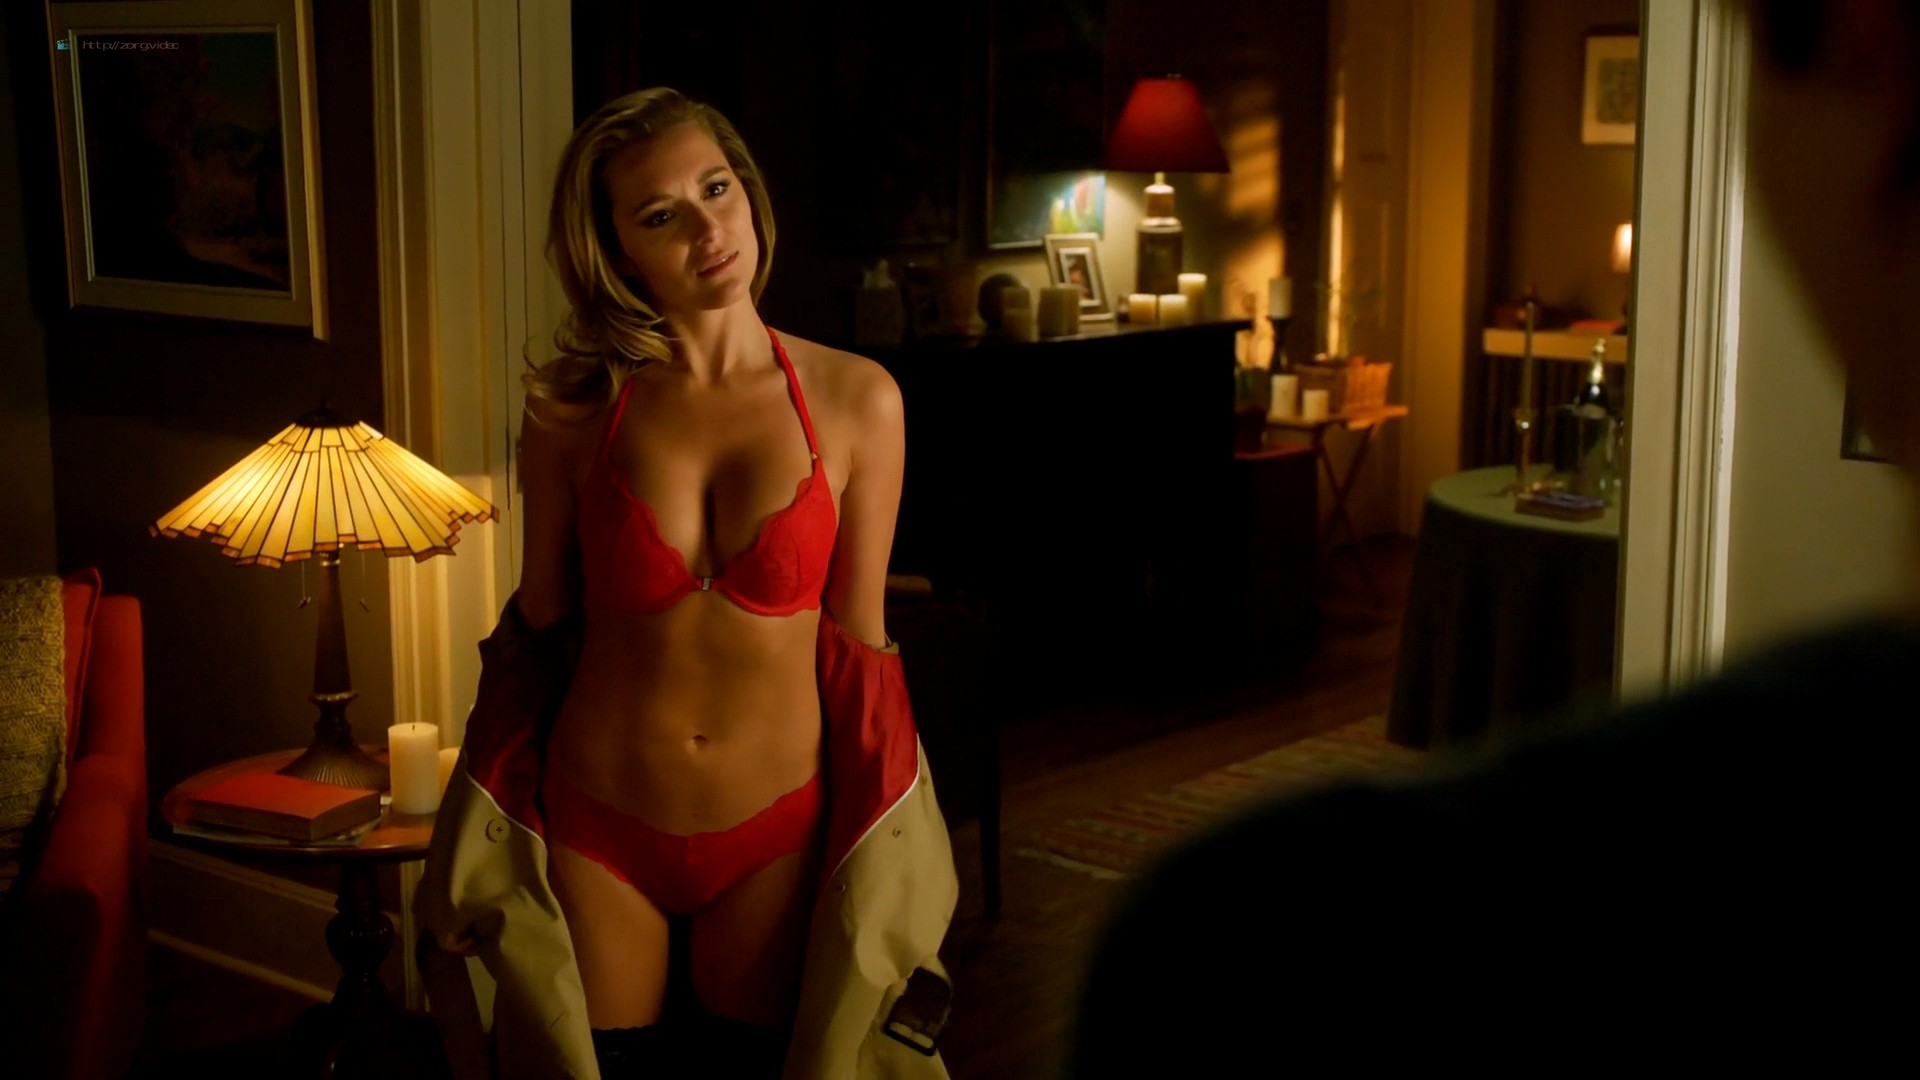 Alexa Vega hot and some sex - The Tomorrow People (2014) s1e18-19 HD (5)